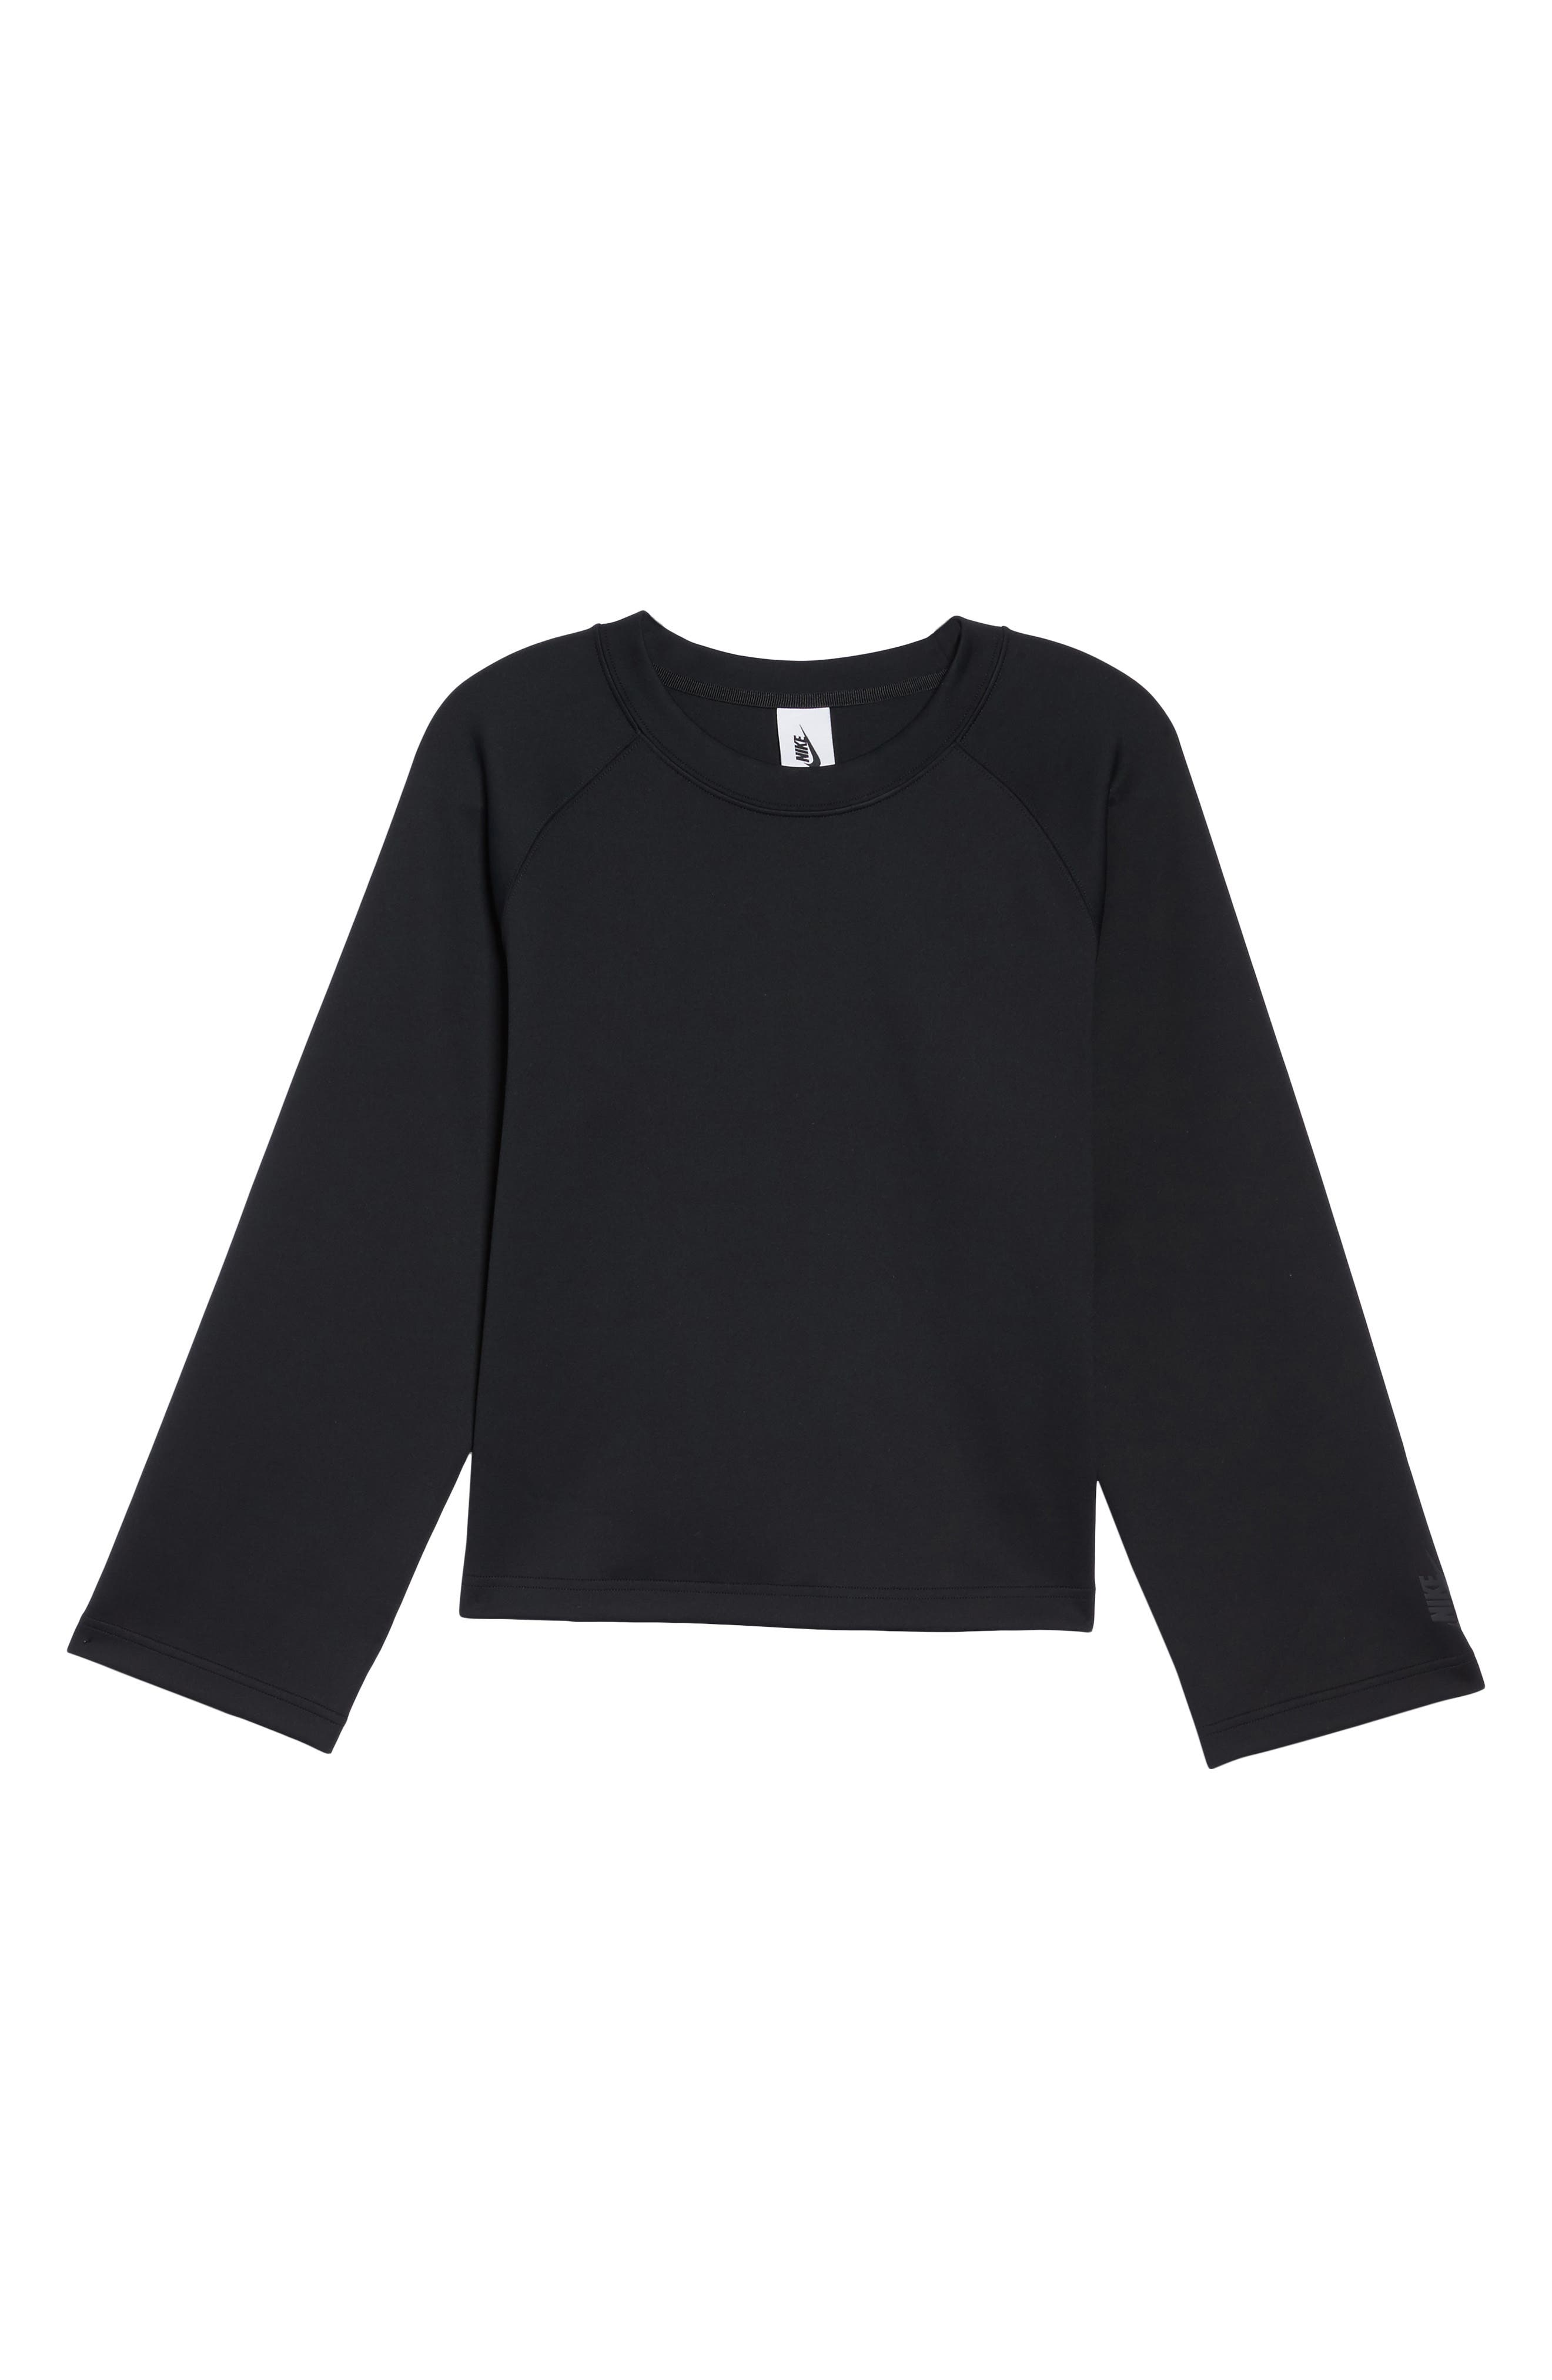 NikeLab Essentials Women's Fleece Top,                             Alternate thumbnail 7, color,                             010